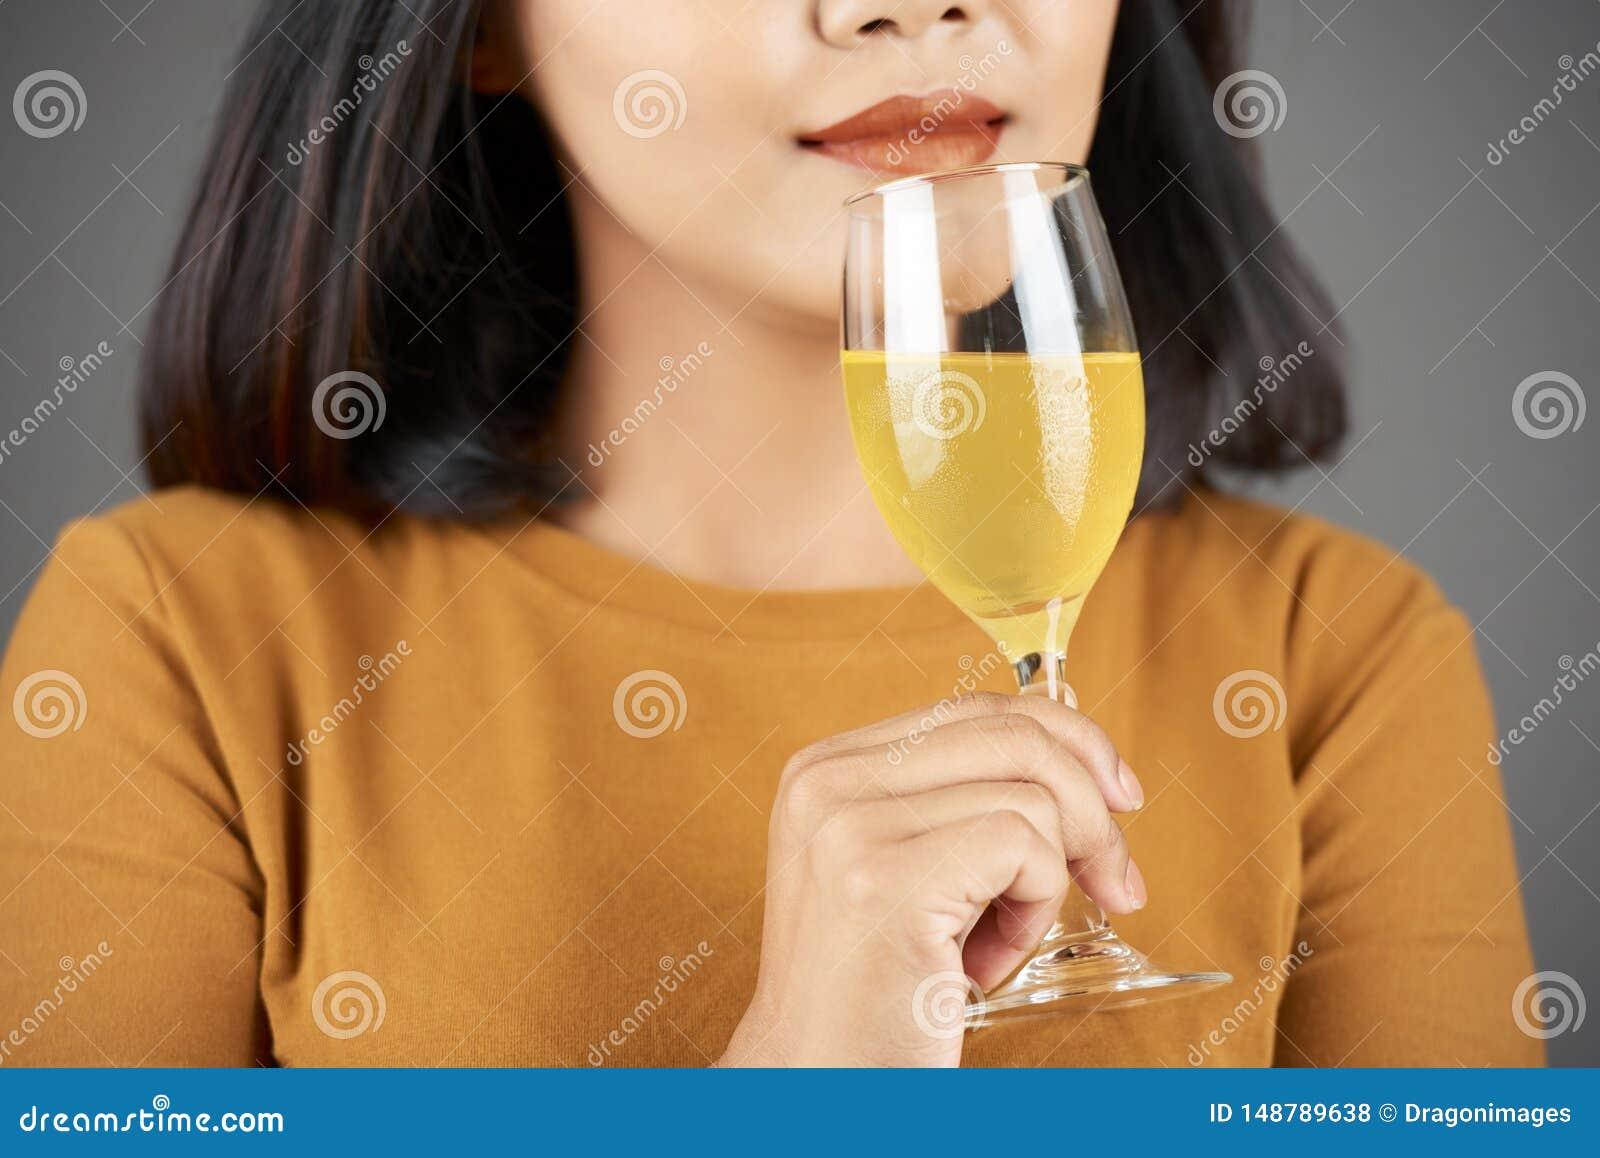 Woman smelling juice